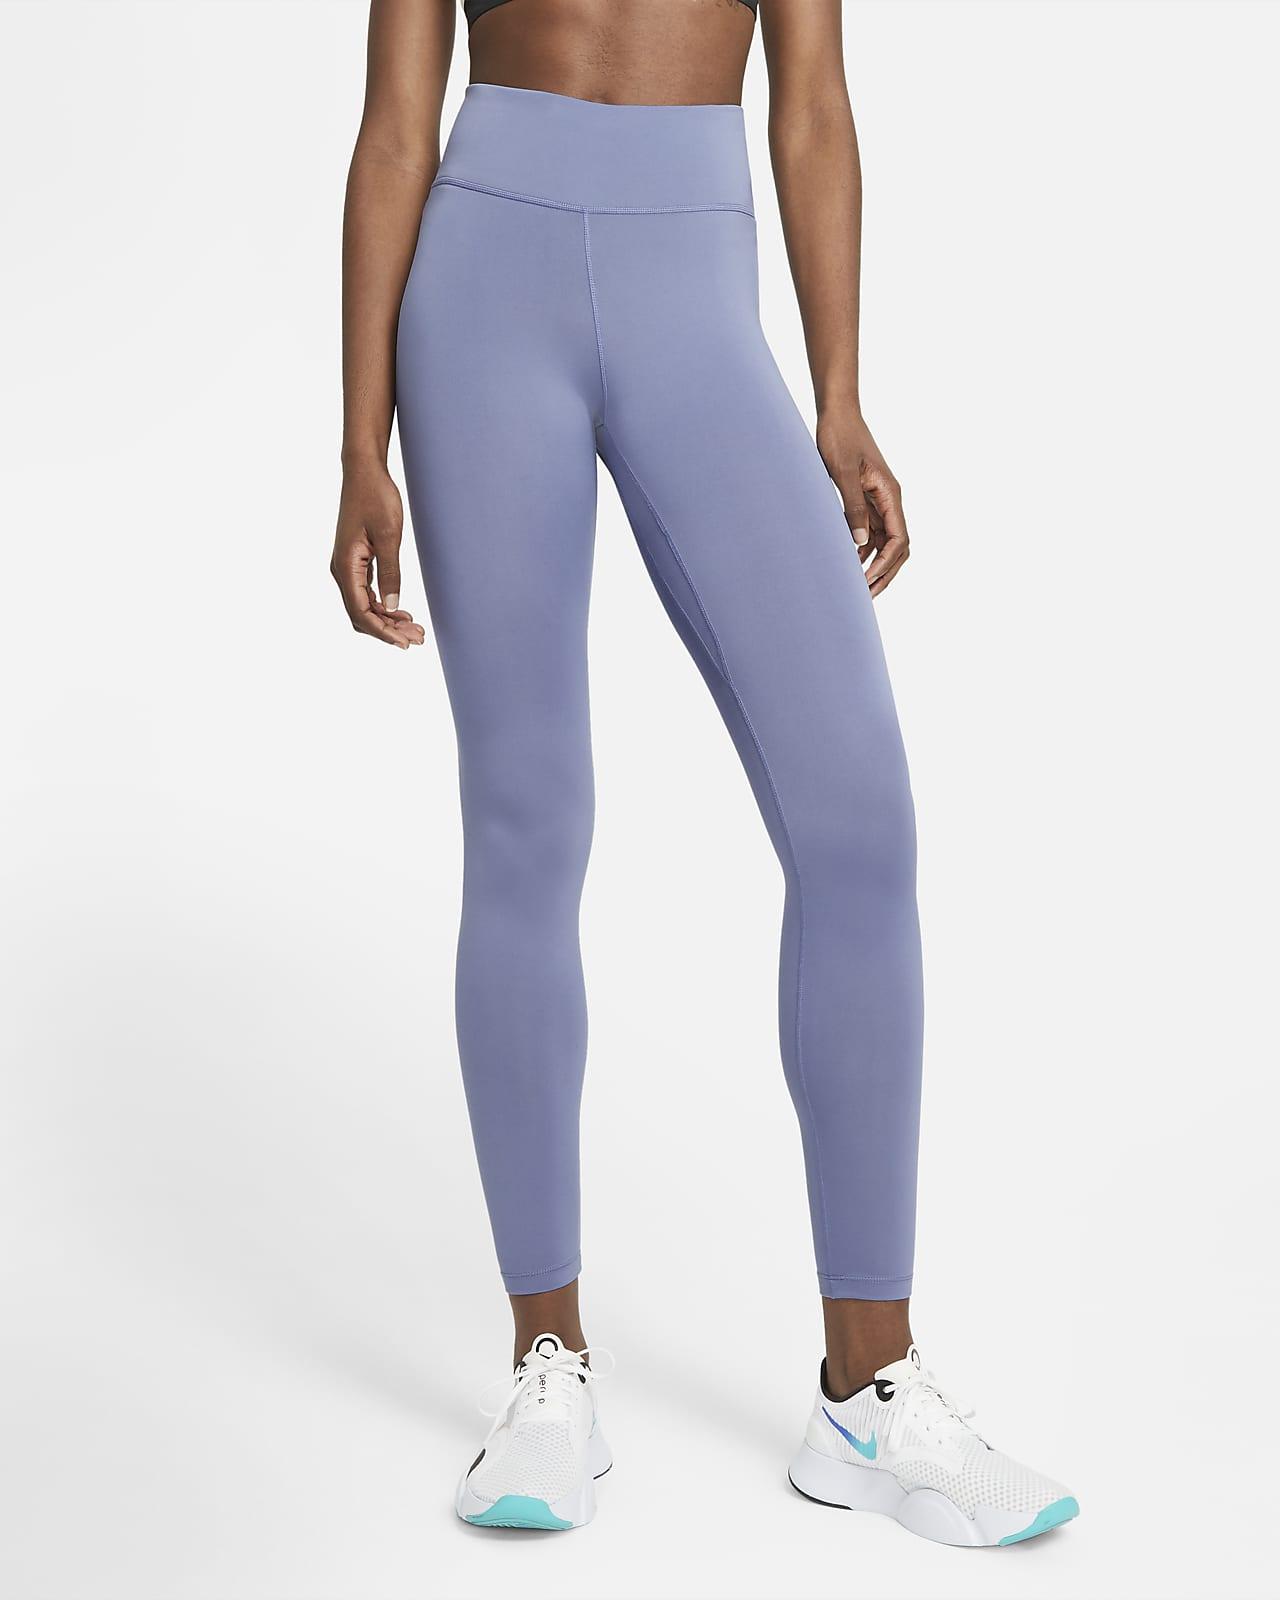 Nike One Mallas de talle medio - Mujer